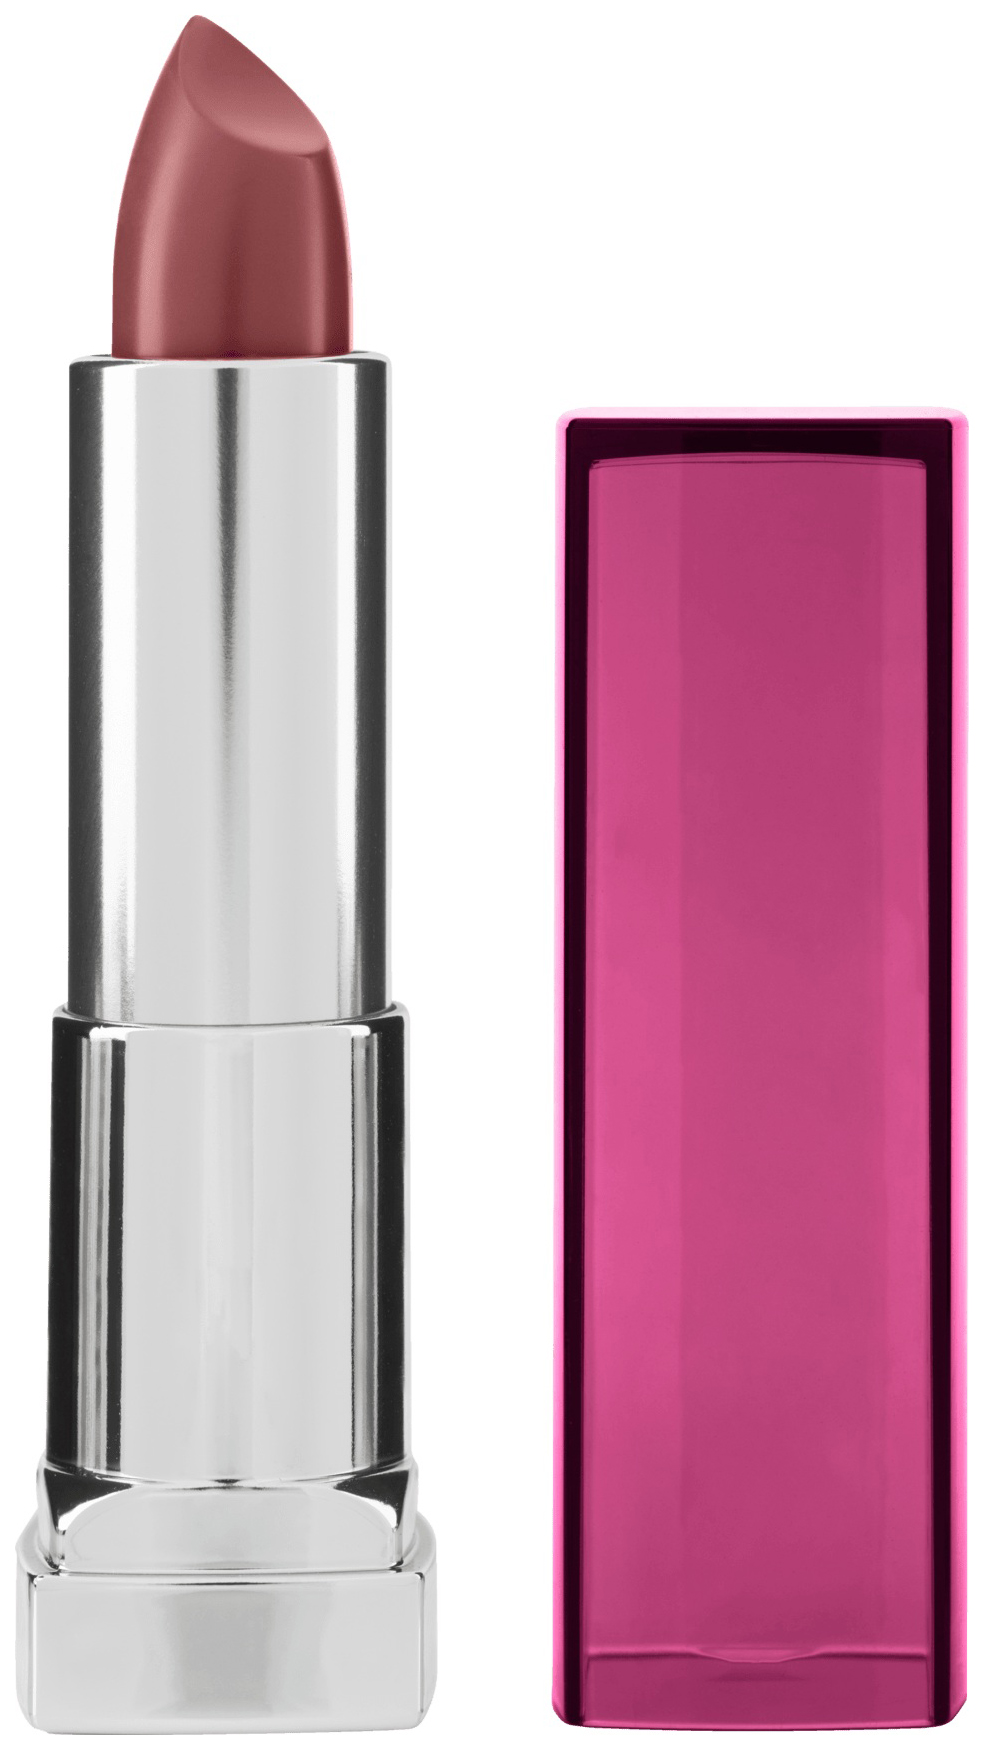 Помада Maybelline Color Sensational Smoked Roses Lipstick 305 Frozen Rose 4,4 г